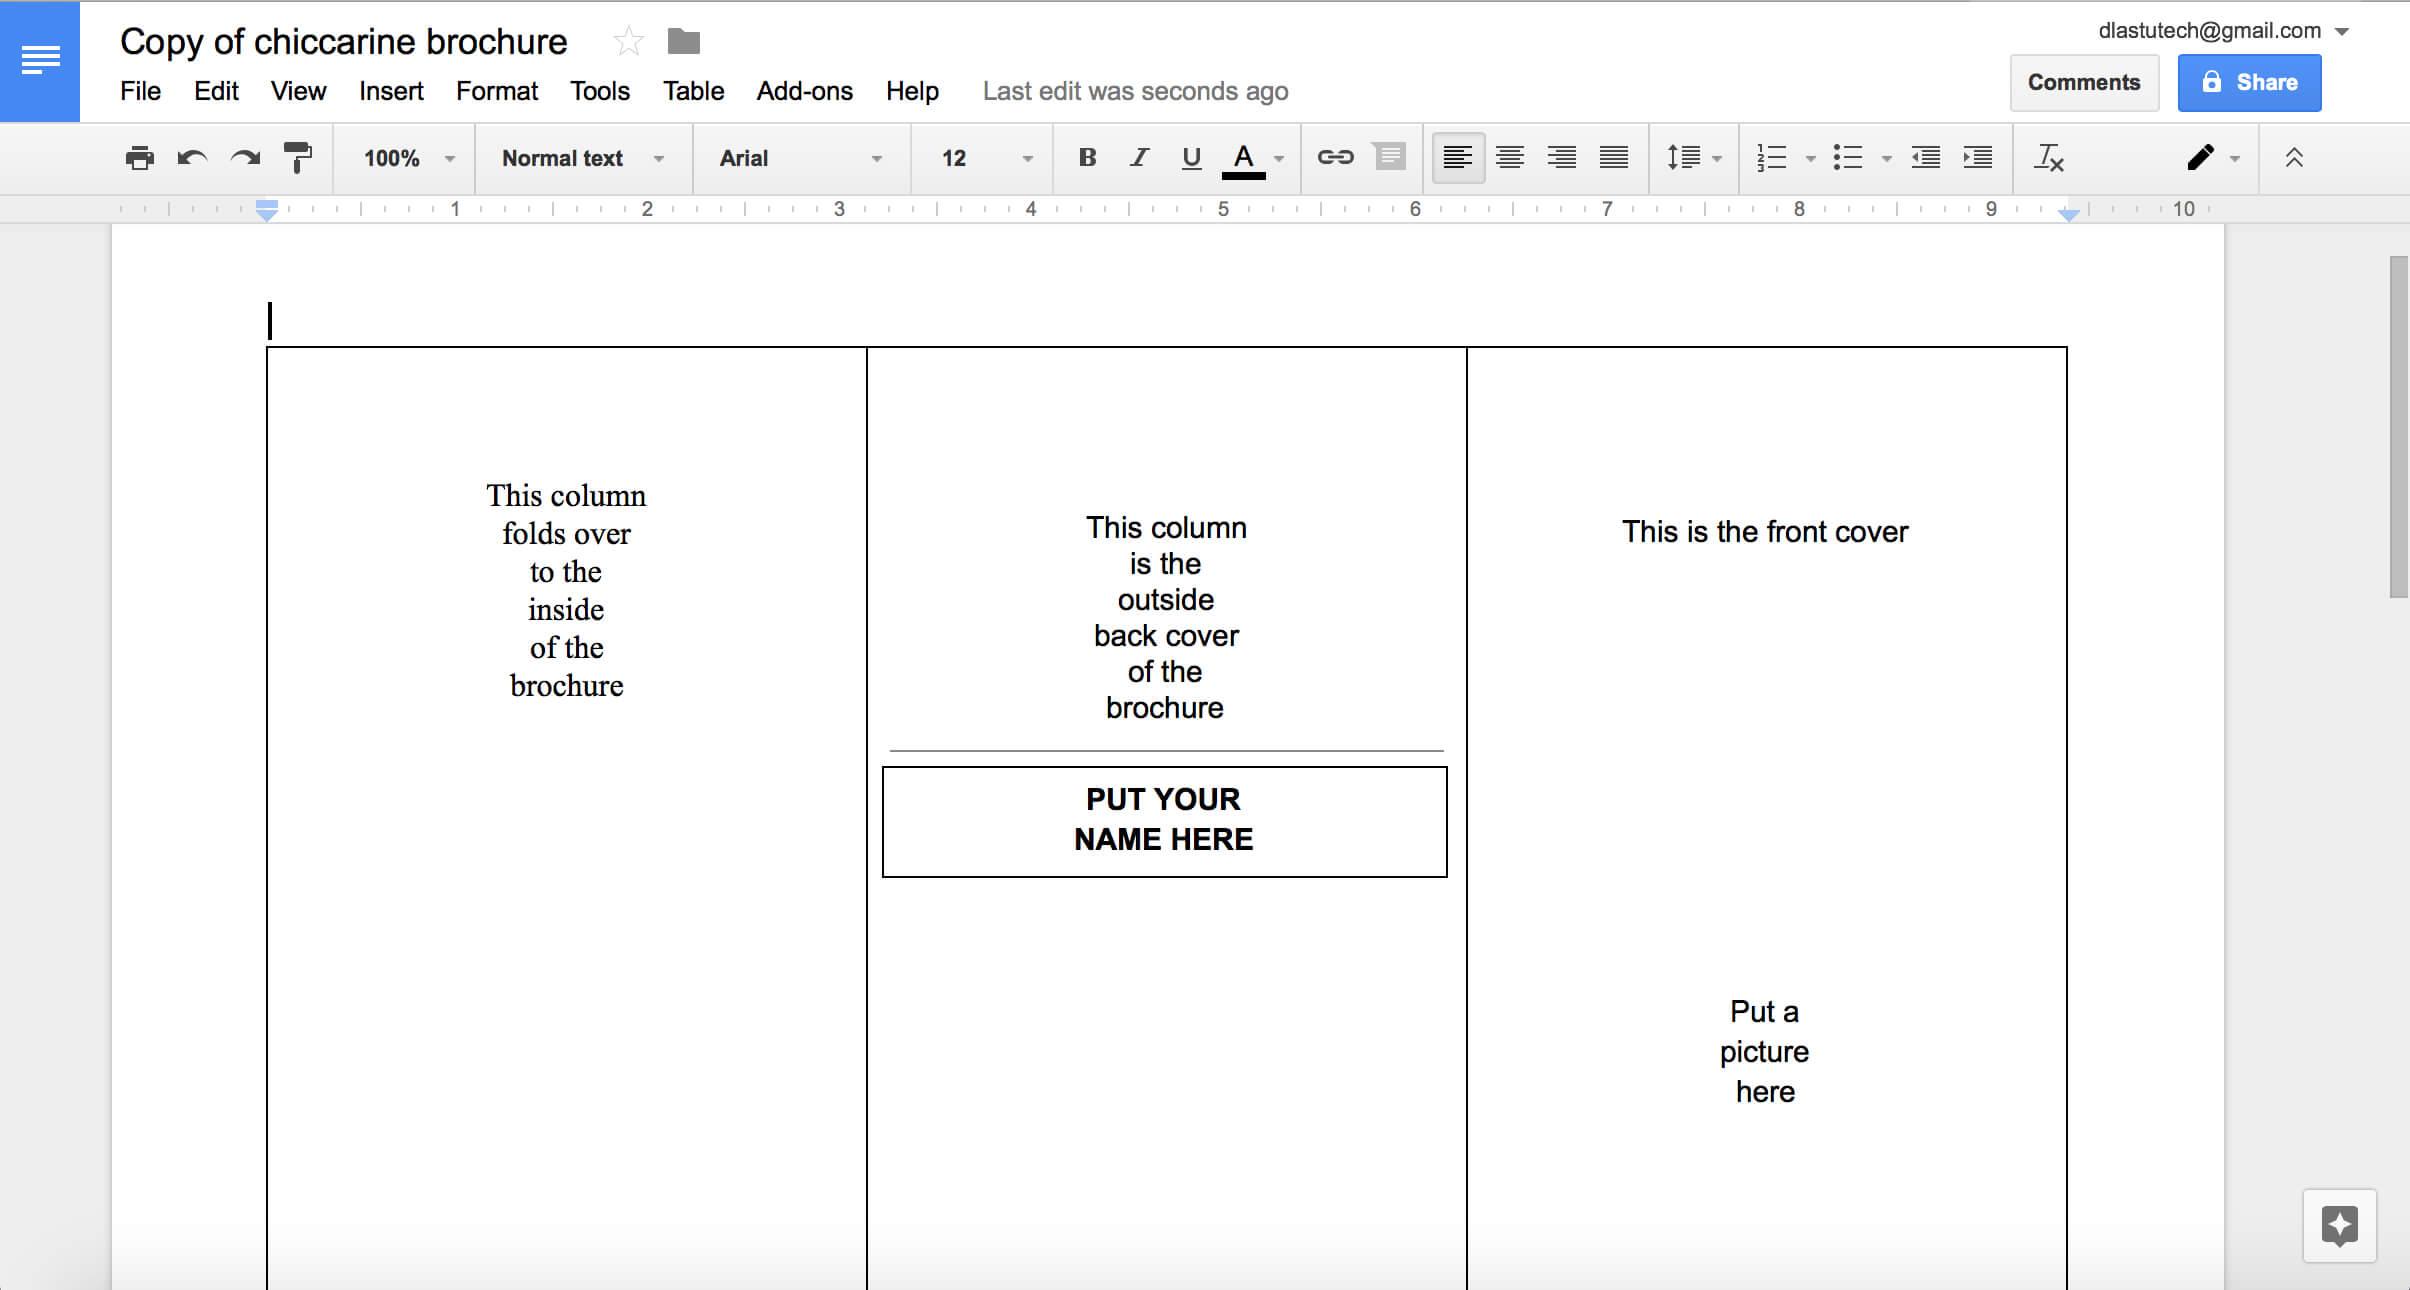 017 Template Ideas Blank Tri Fold Brochure Google Docs Intended For Google Docs Tri Fold Brochure Template